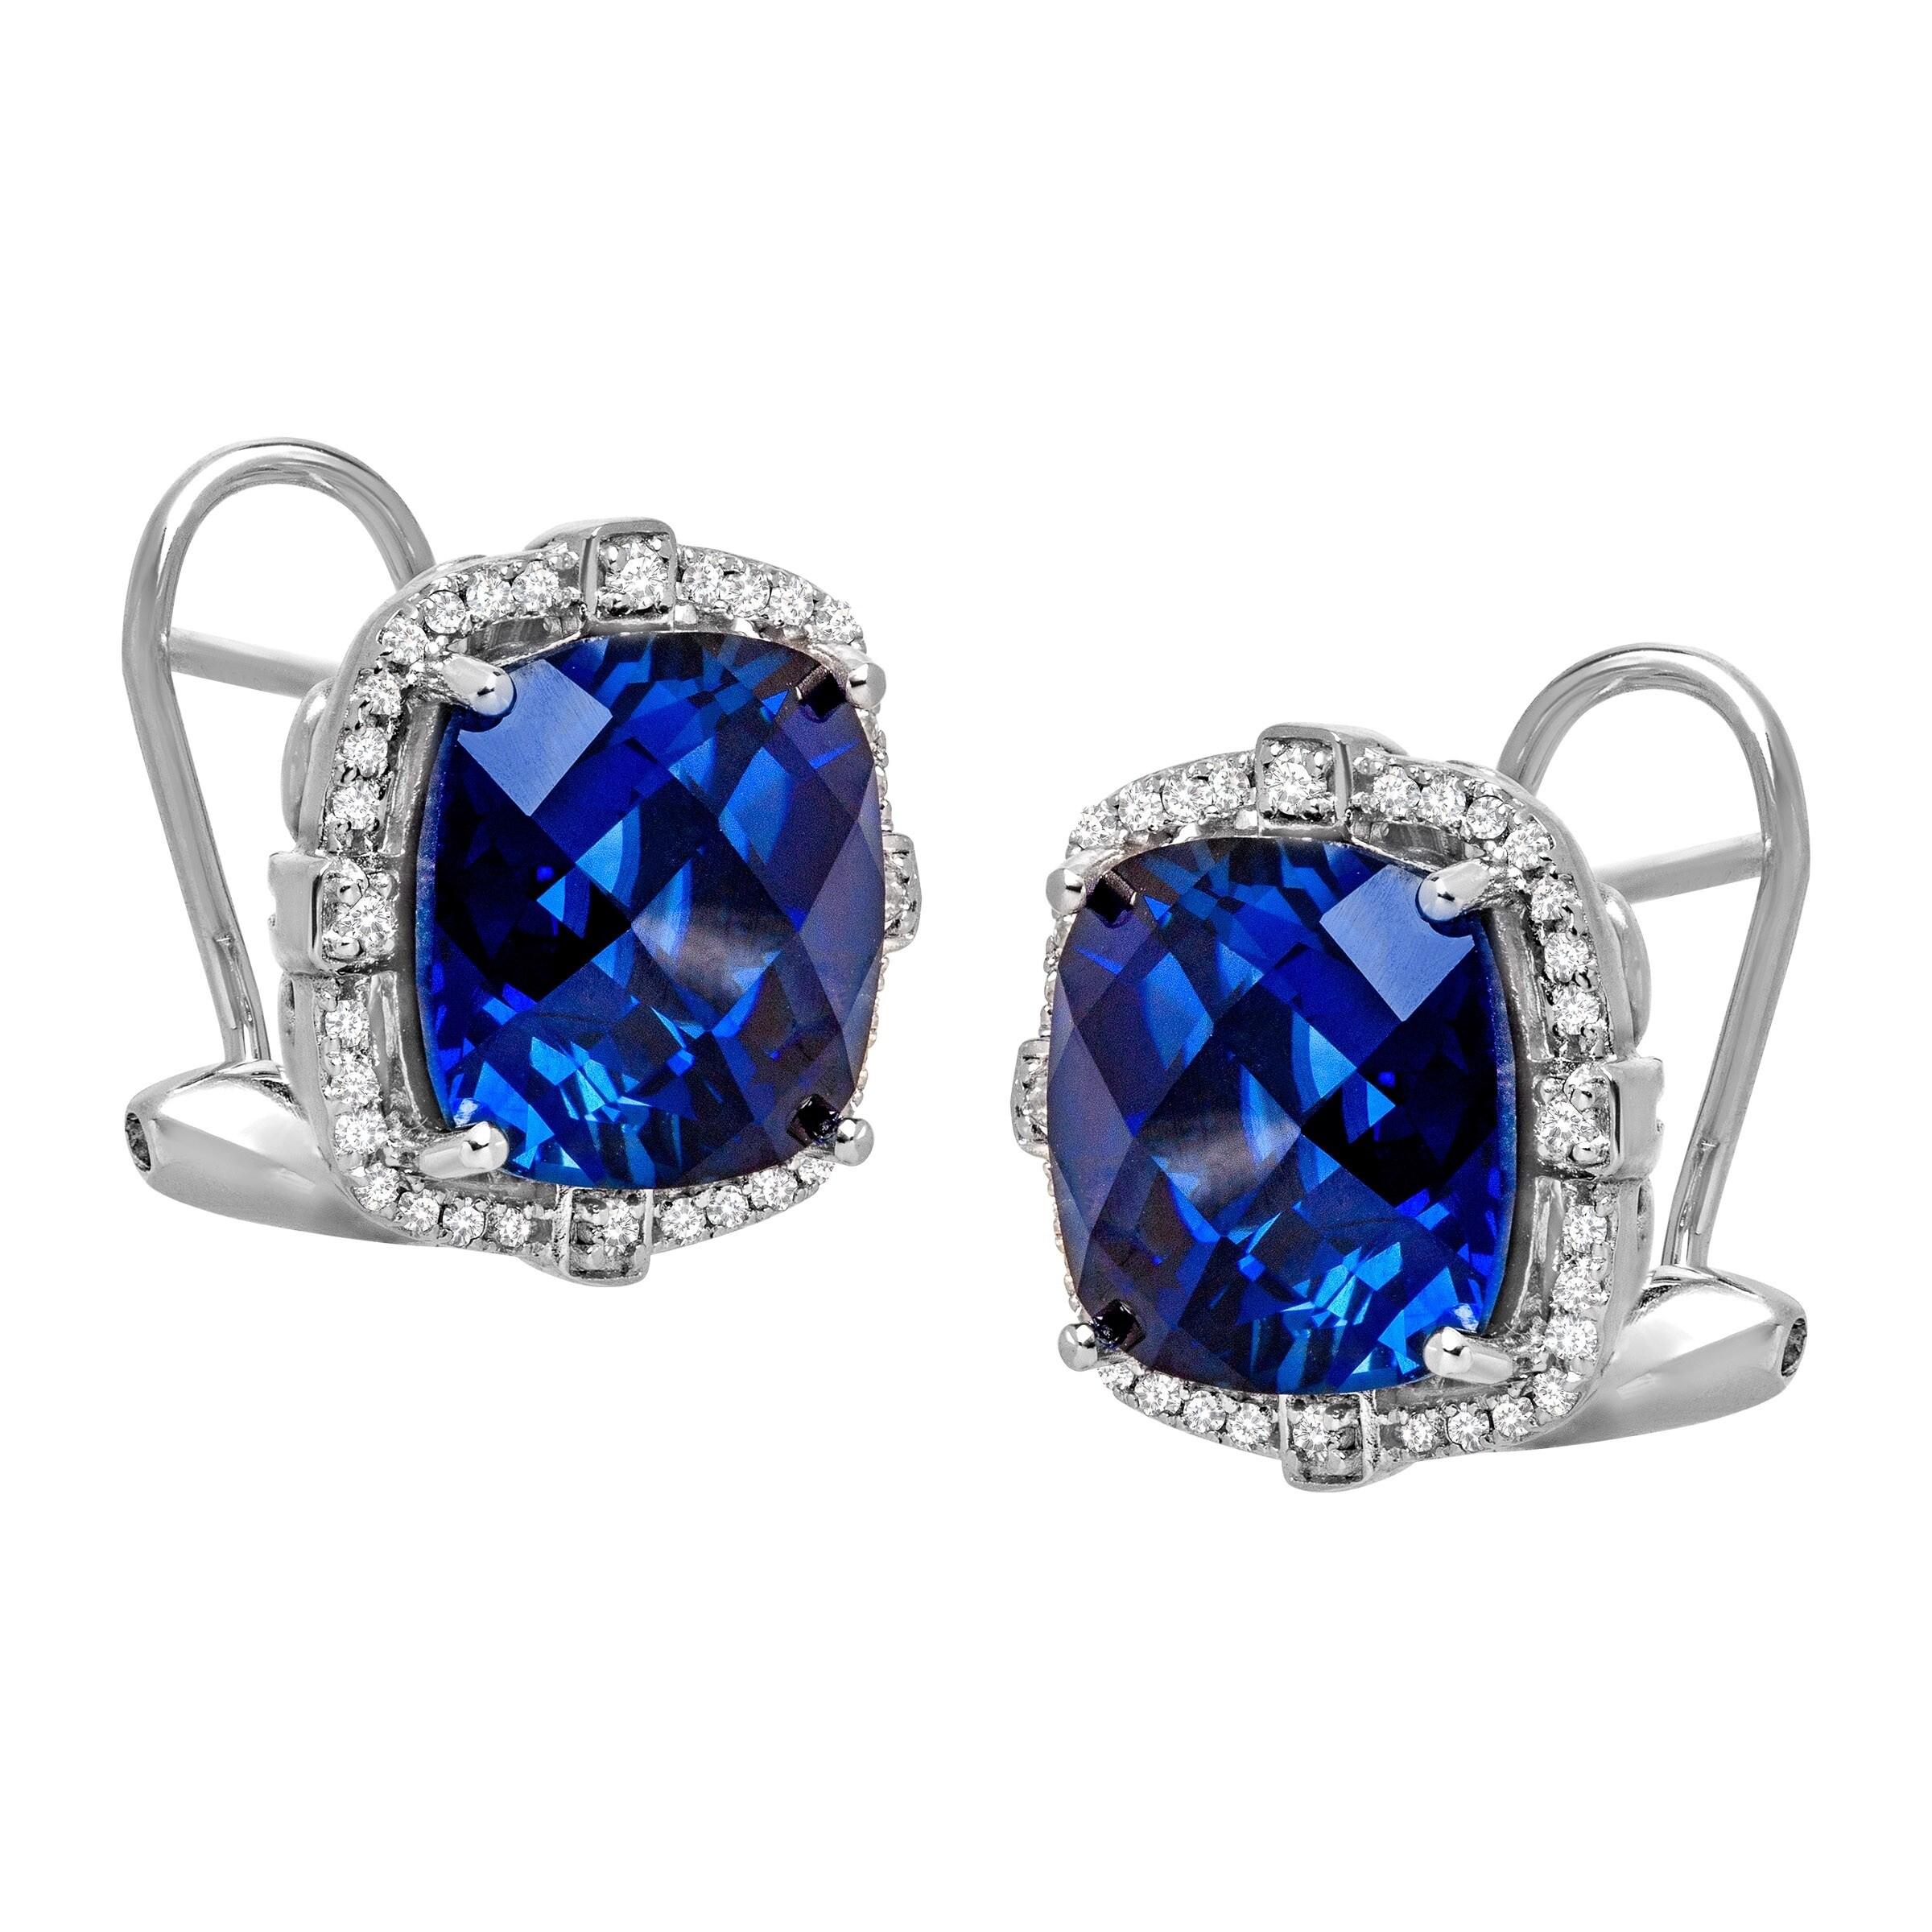 3 Ct Blue Sapphire /& Diamond Trillion Stud Earrings .925 Sterling Silver